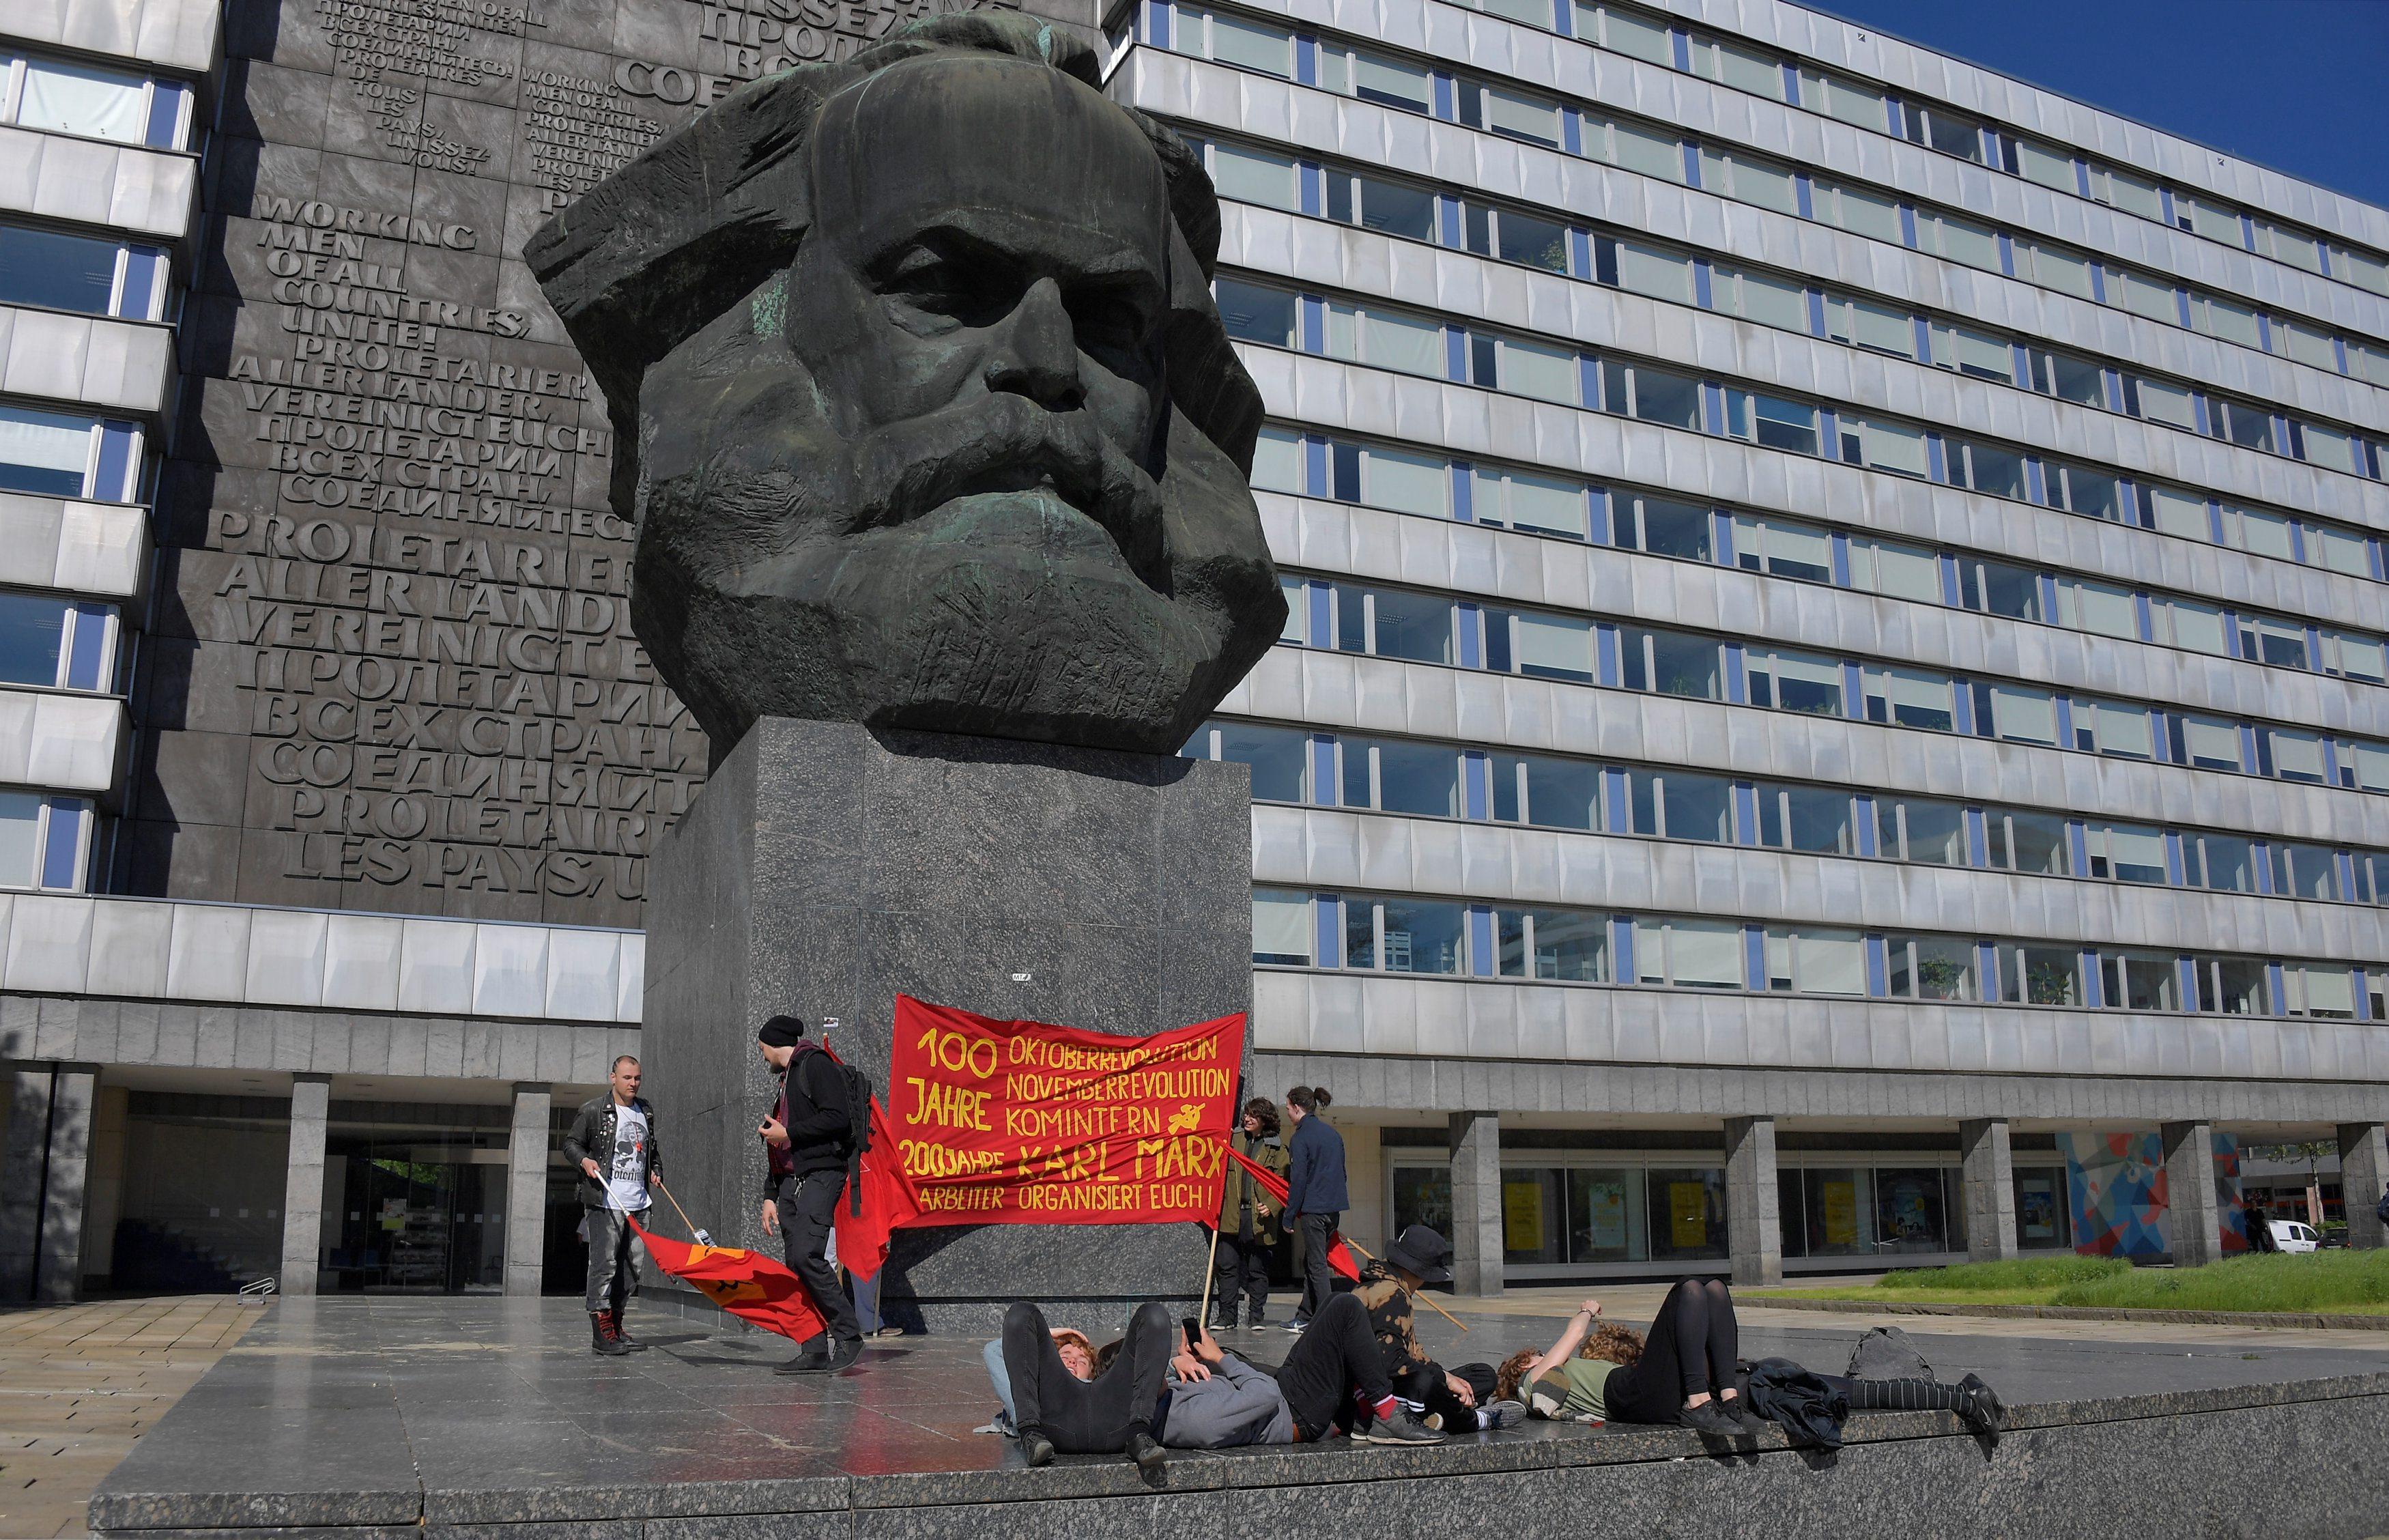 Spomenik Karlu Marxu u Chemnitzu, Njemačka